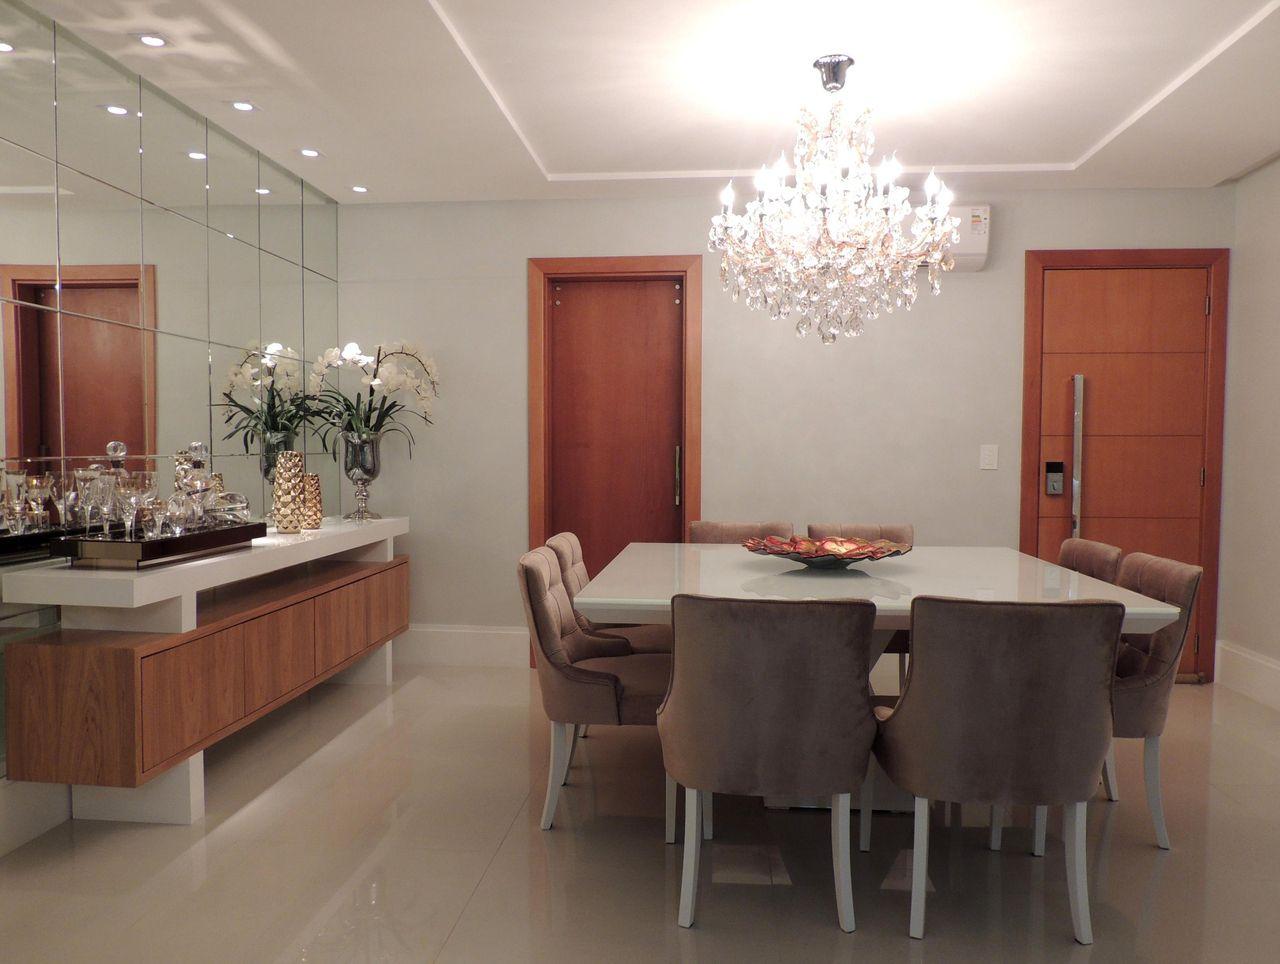 Luminaria Para Sala De Estar Pequena Iluminao Poder Ser Usado Um  -> Lustres Pendentes Para Sala De Jantar Pequena